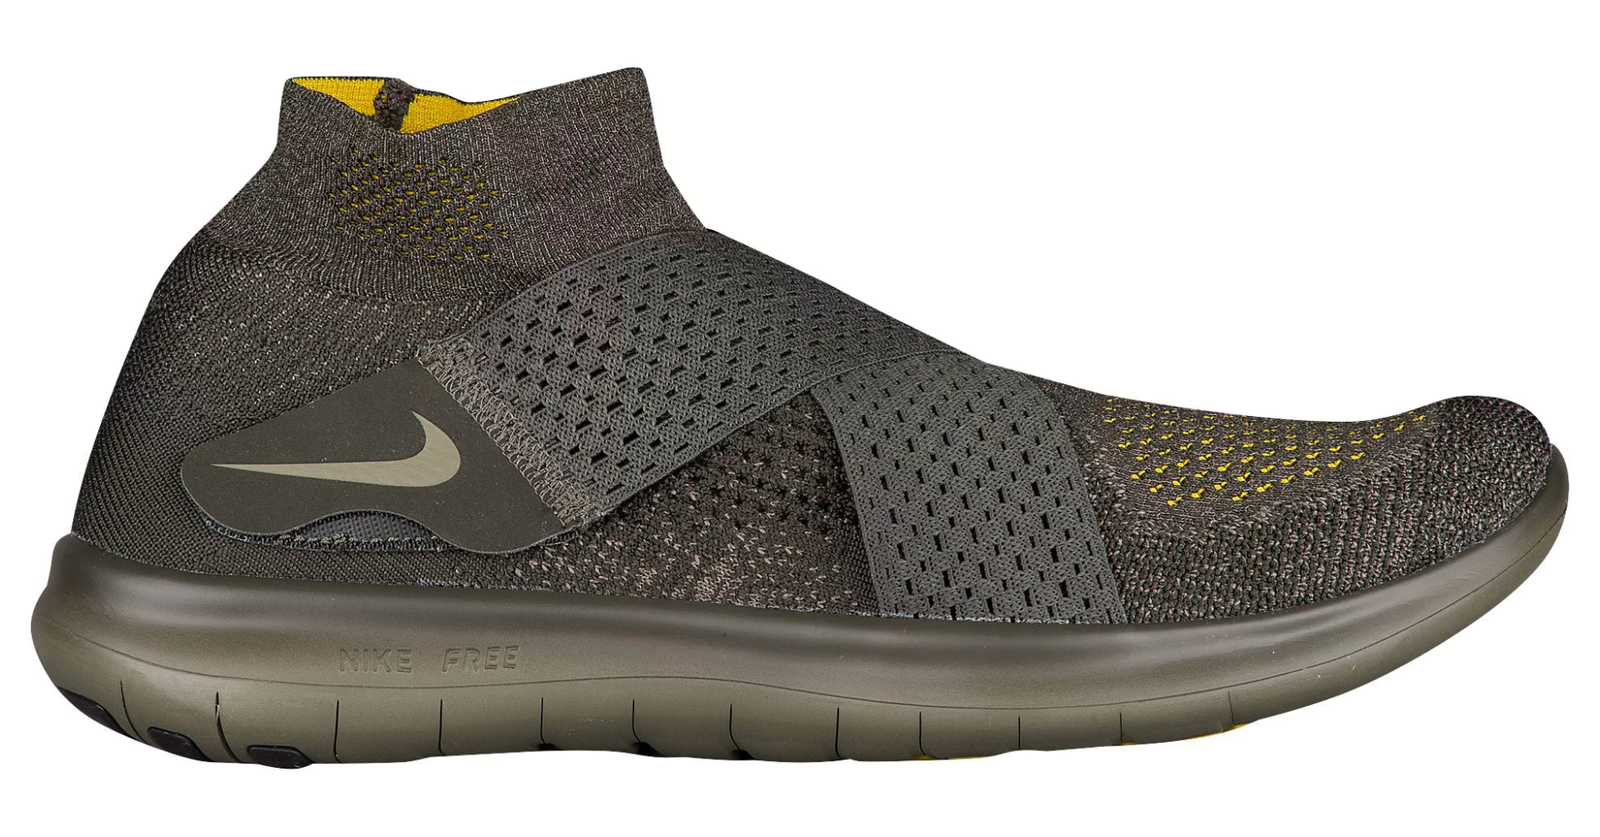 Nike Free RN Motion Flyknit Sequioa/Medium Olive Men's Shoes Size 10